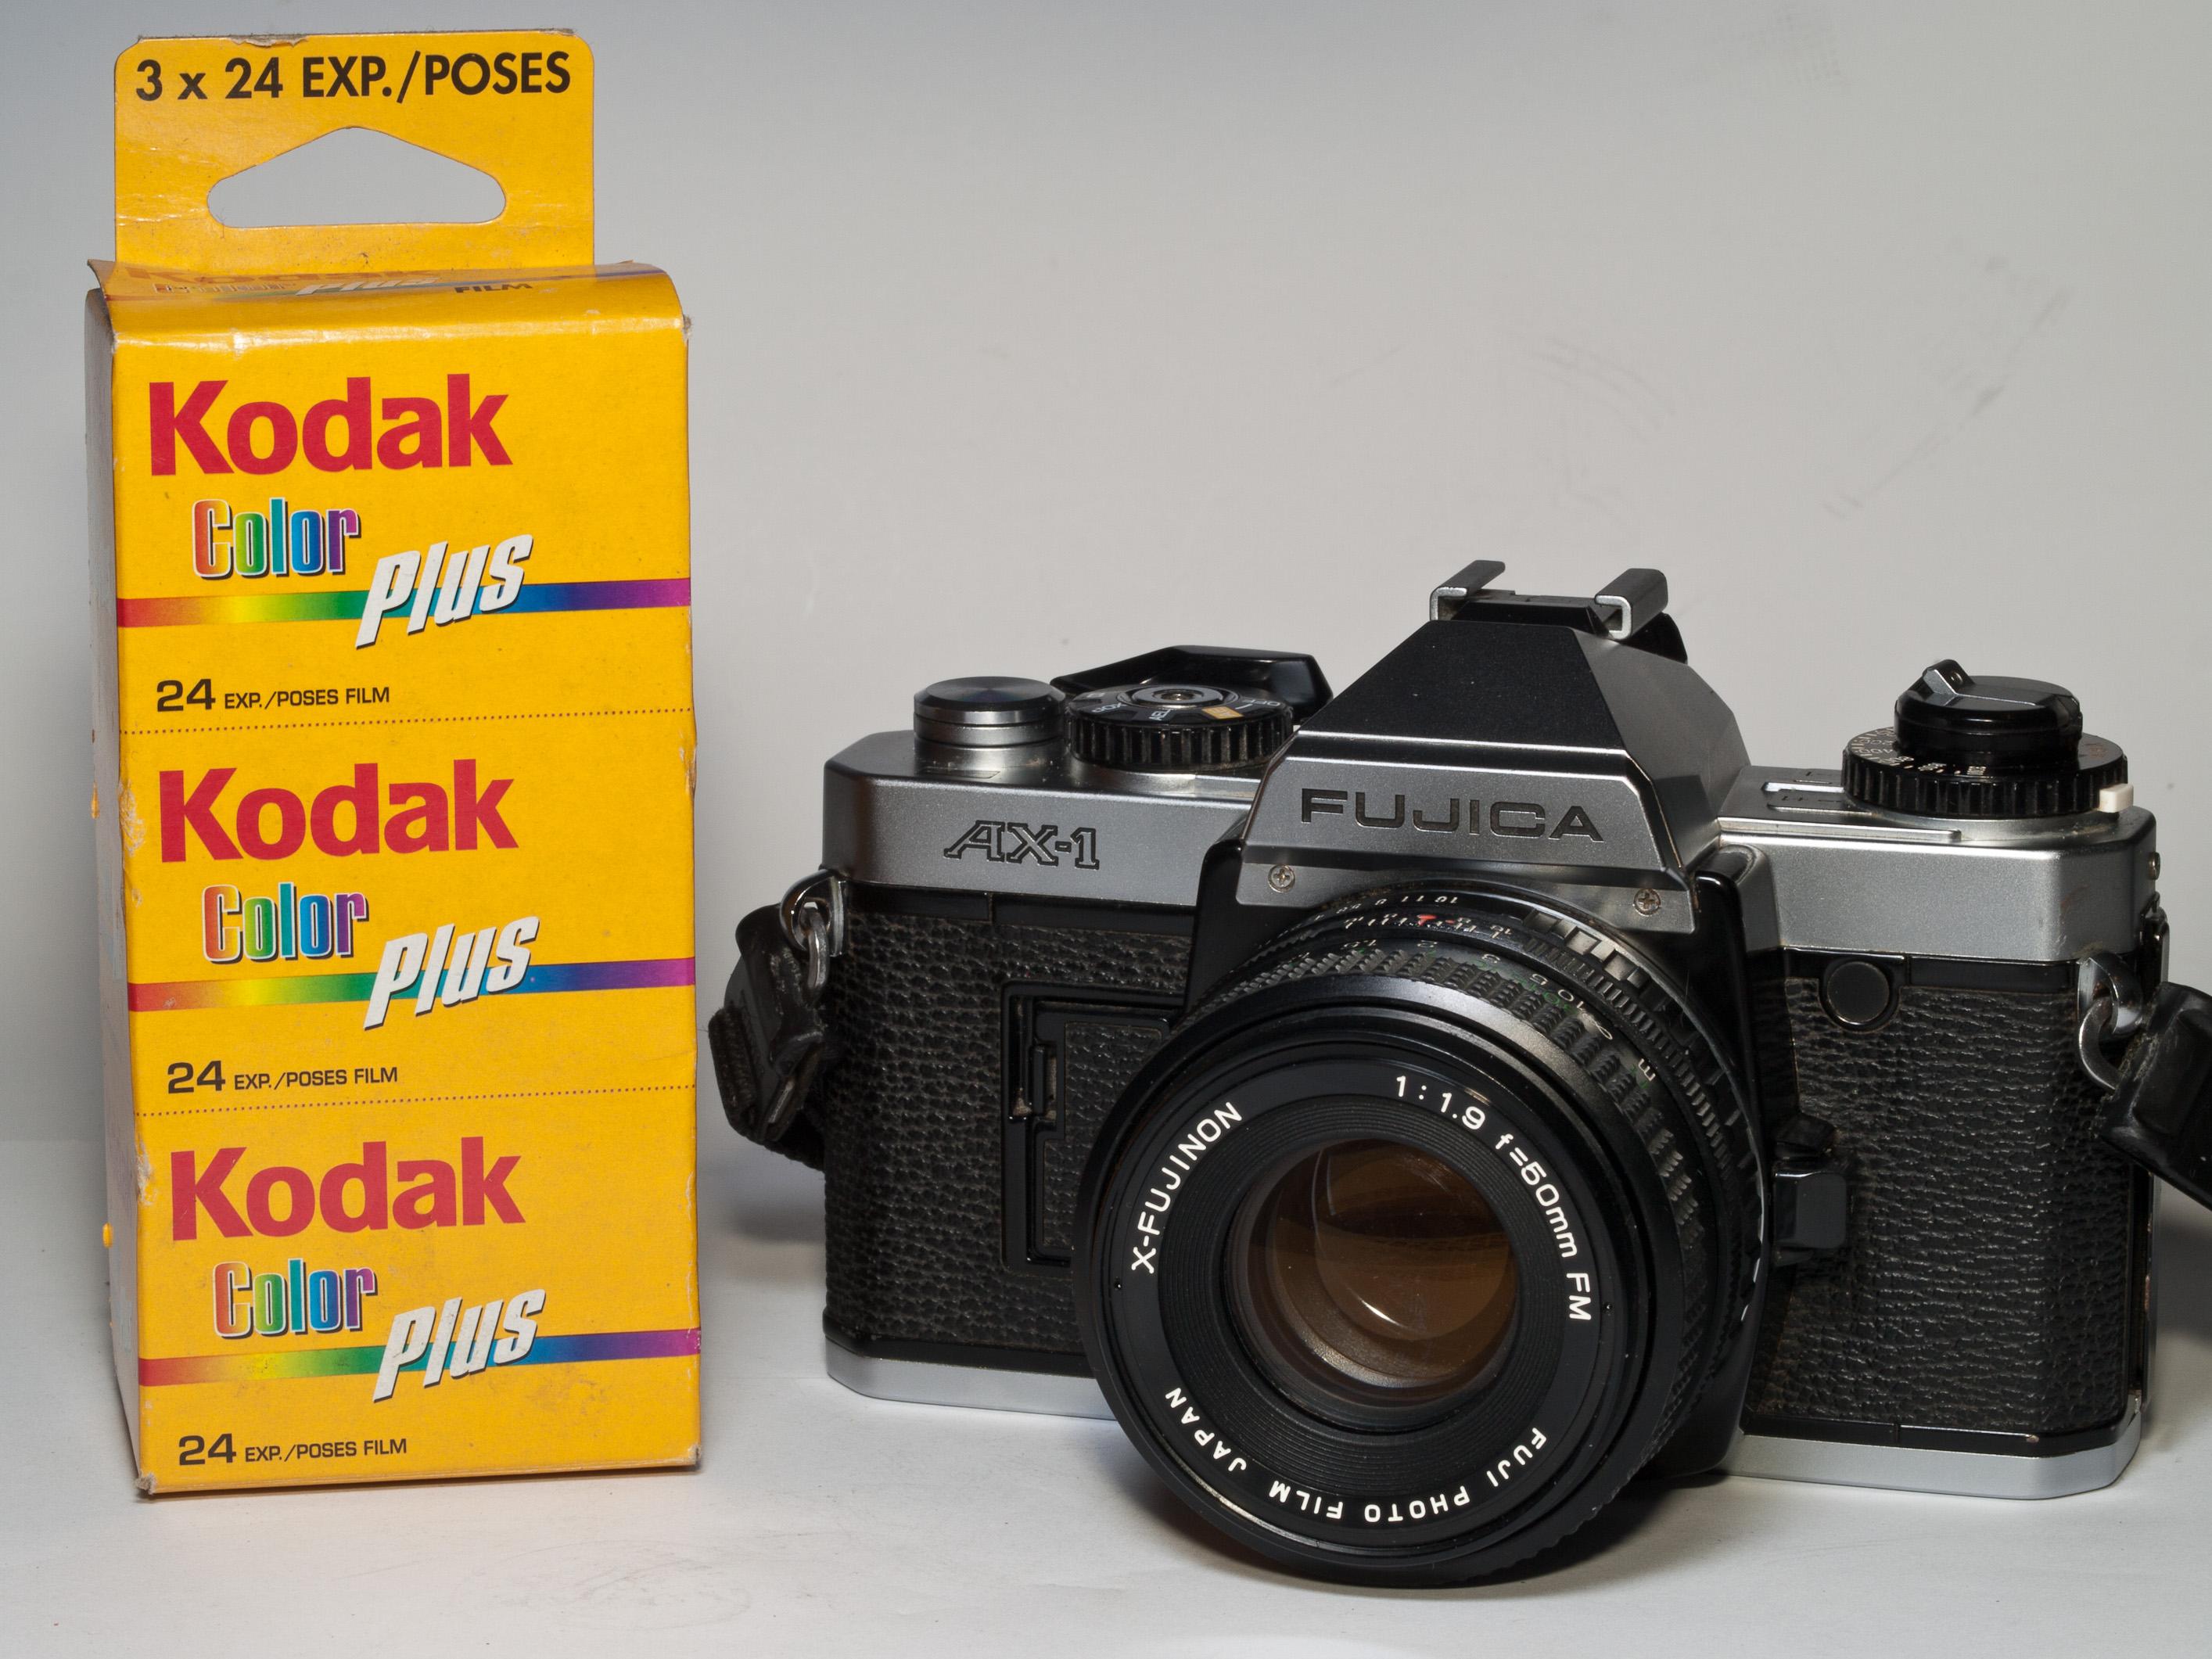 File:Fujica AX-1 SLR and Kodak film.jpg - Wikimedia Commons